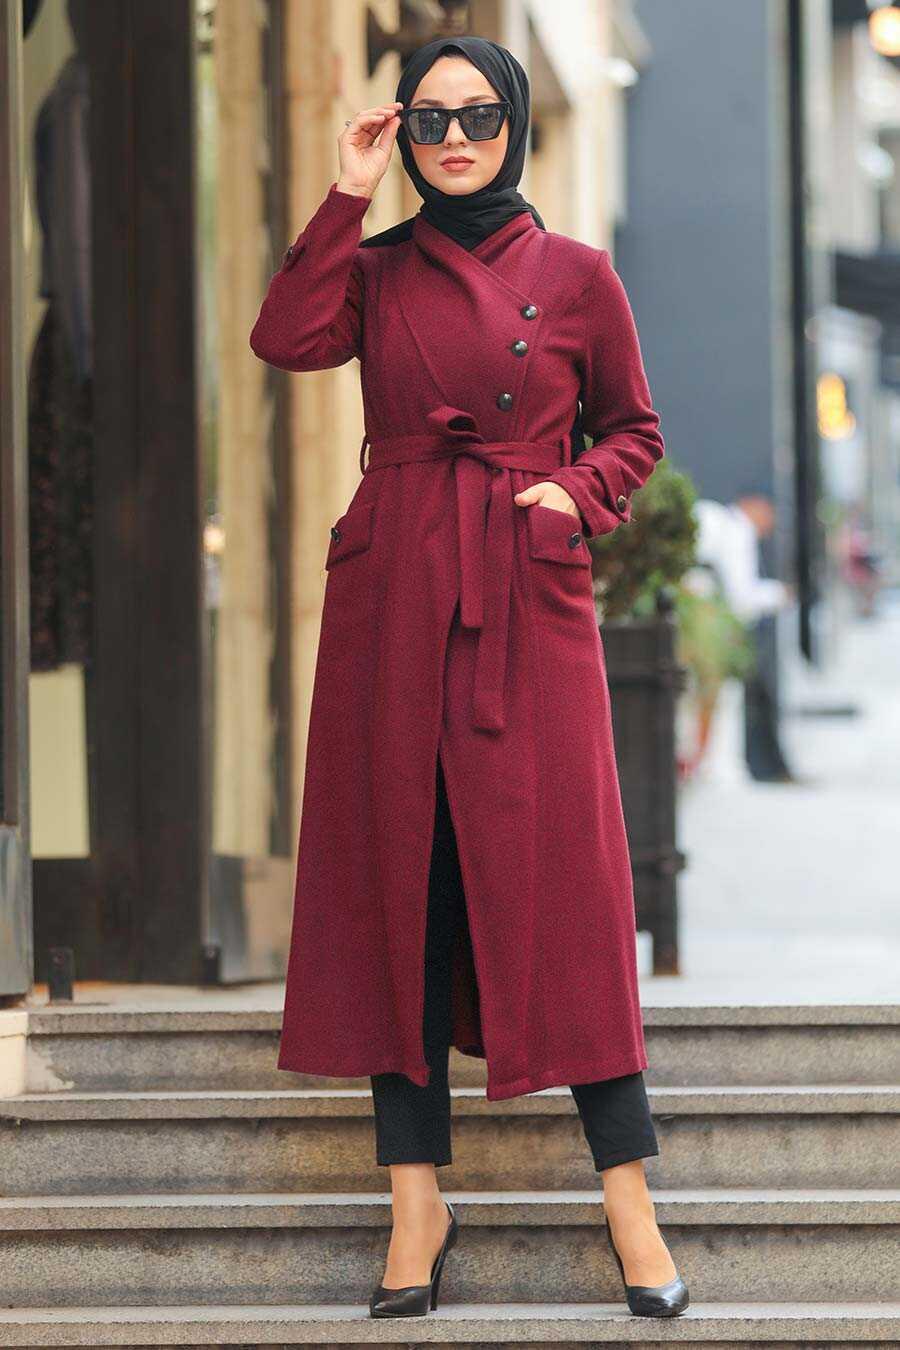 Claret Red Hijab Coat 5074BR